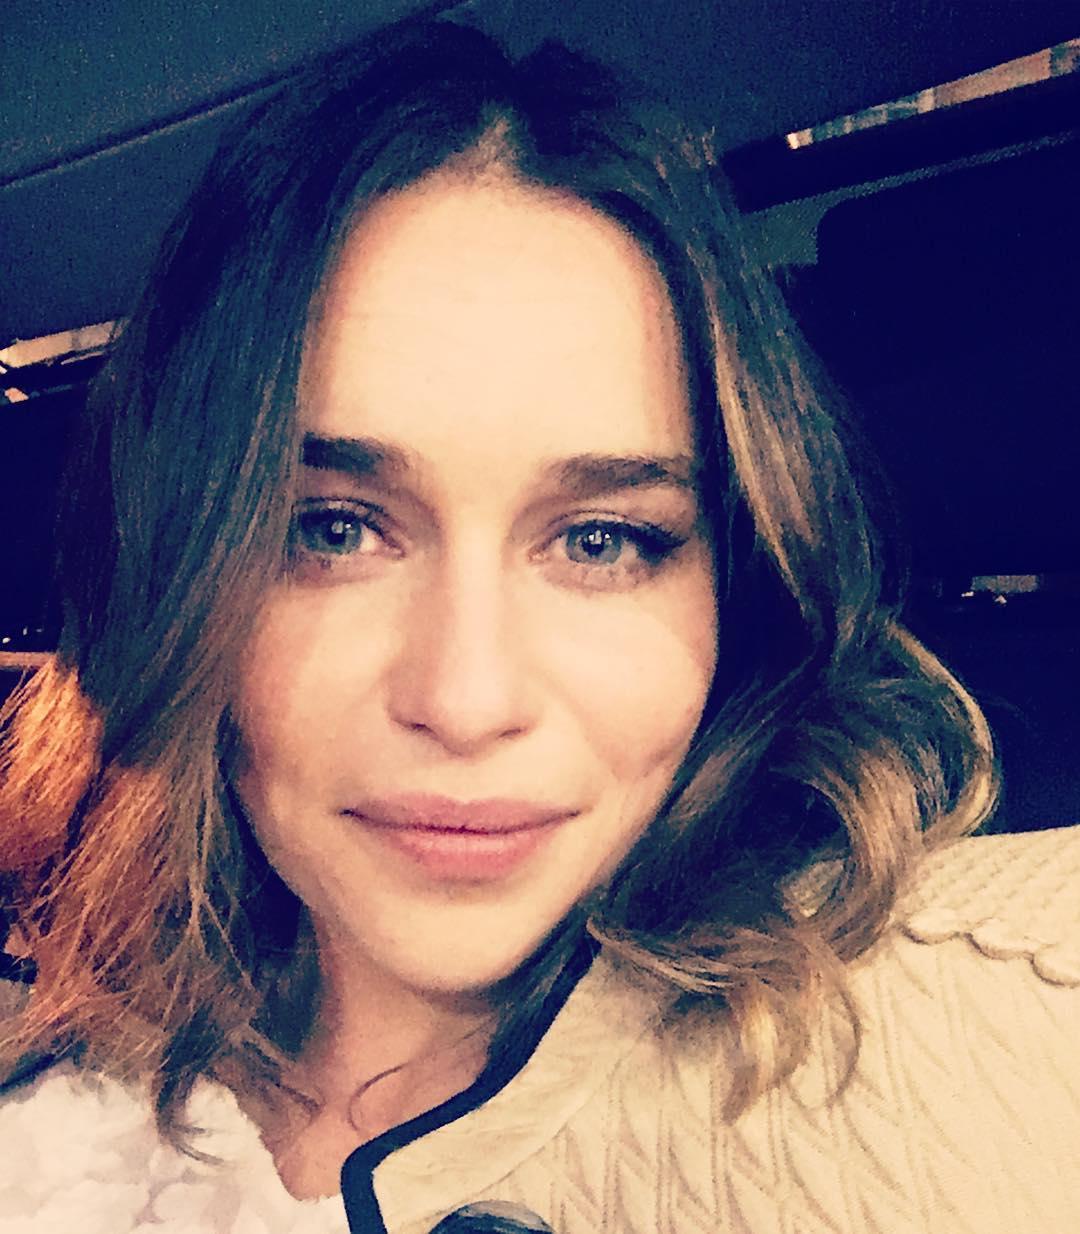 Emilia-Clarke-Wallpapers-Insta-Fit-Bio-7